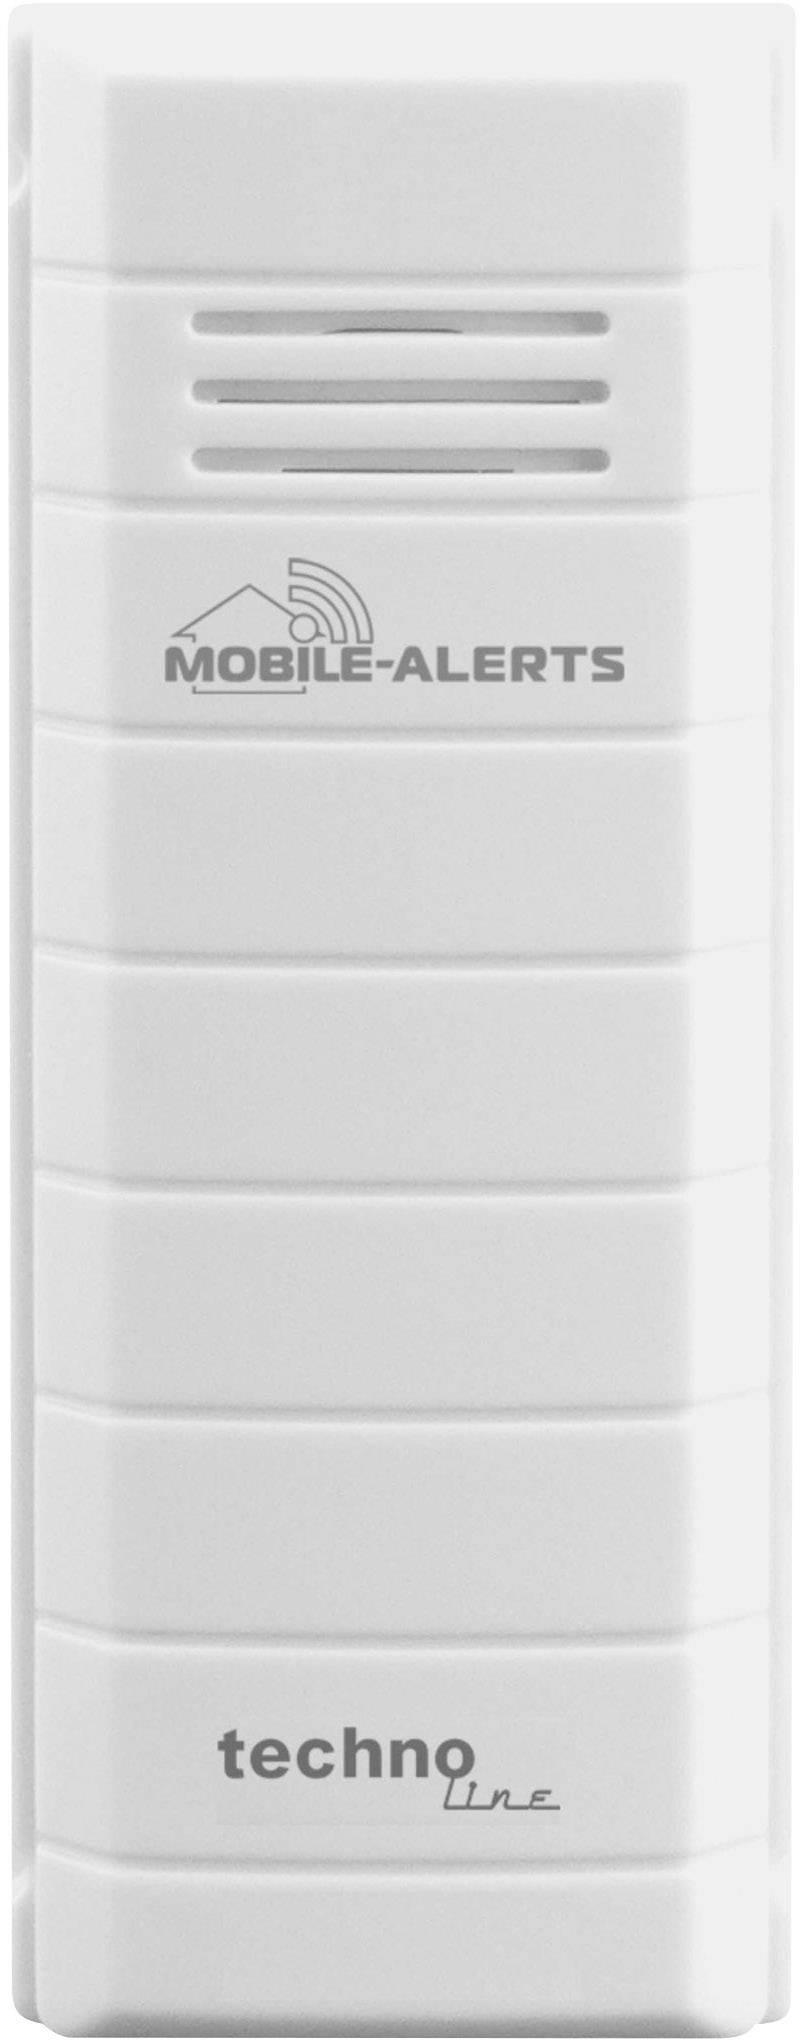 Teplotný senzor Techno Line Mobile Alerts - Temperaturmelder - MA 10100 Mobile Alerts MA 10100